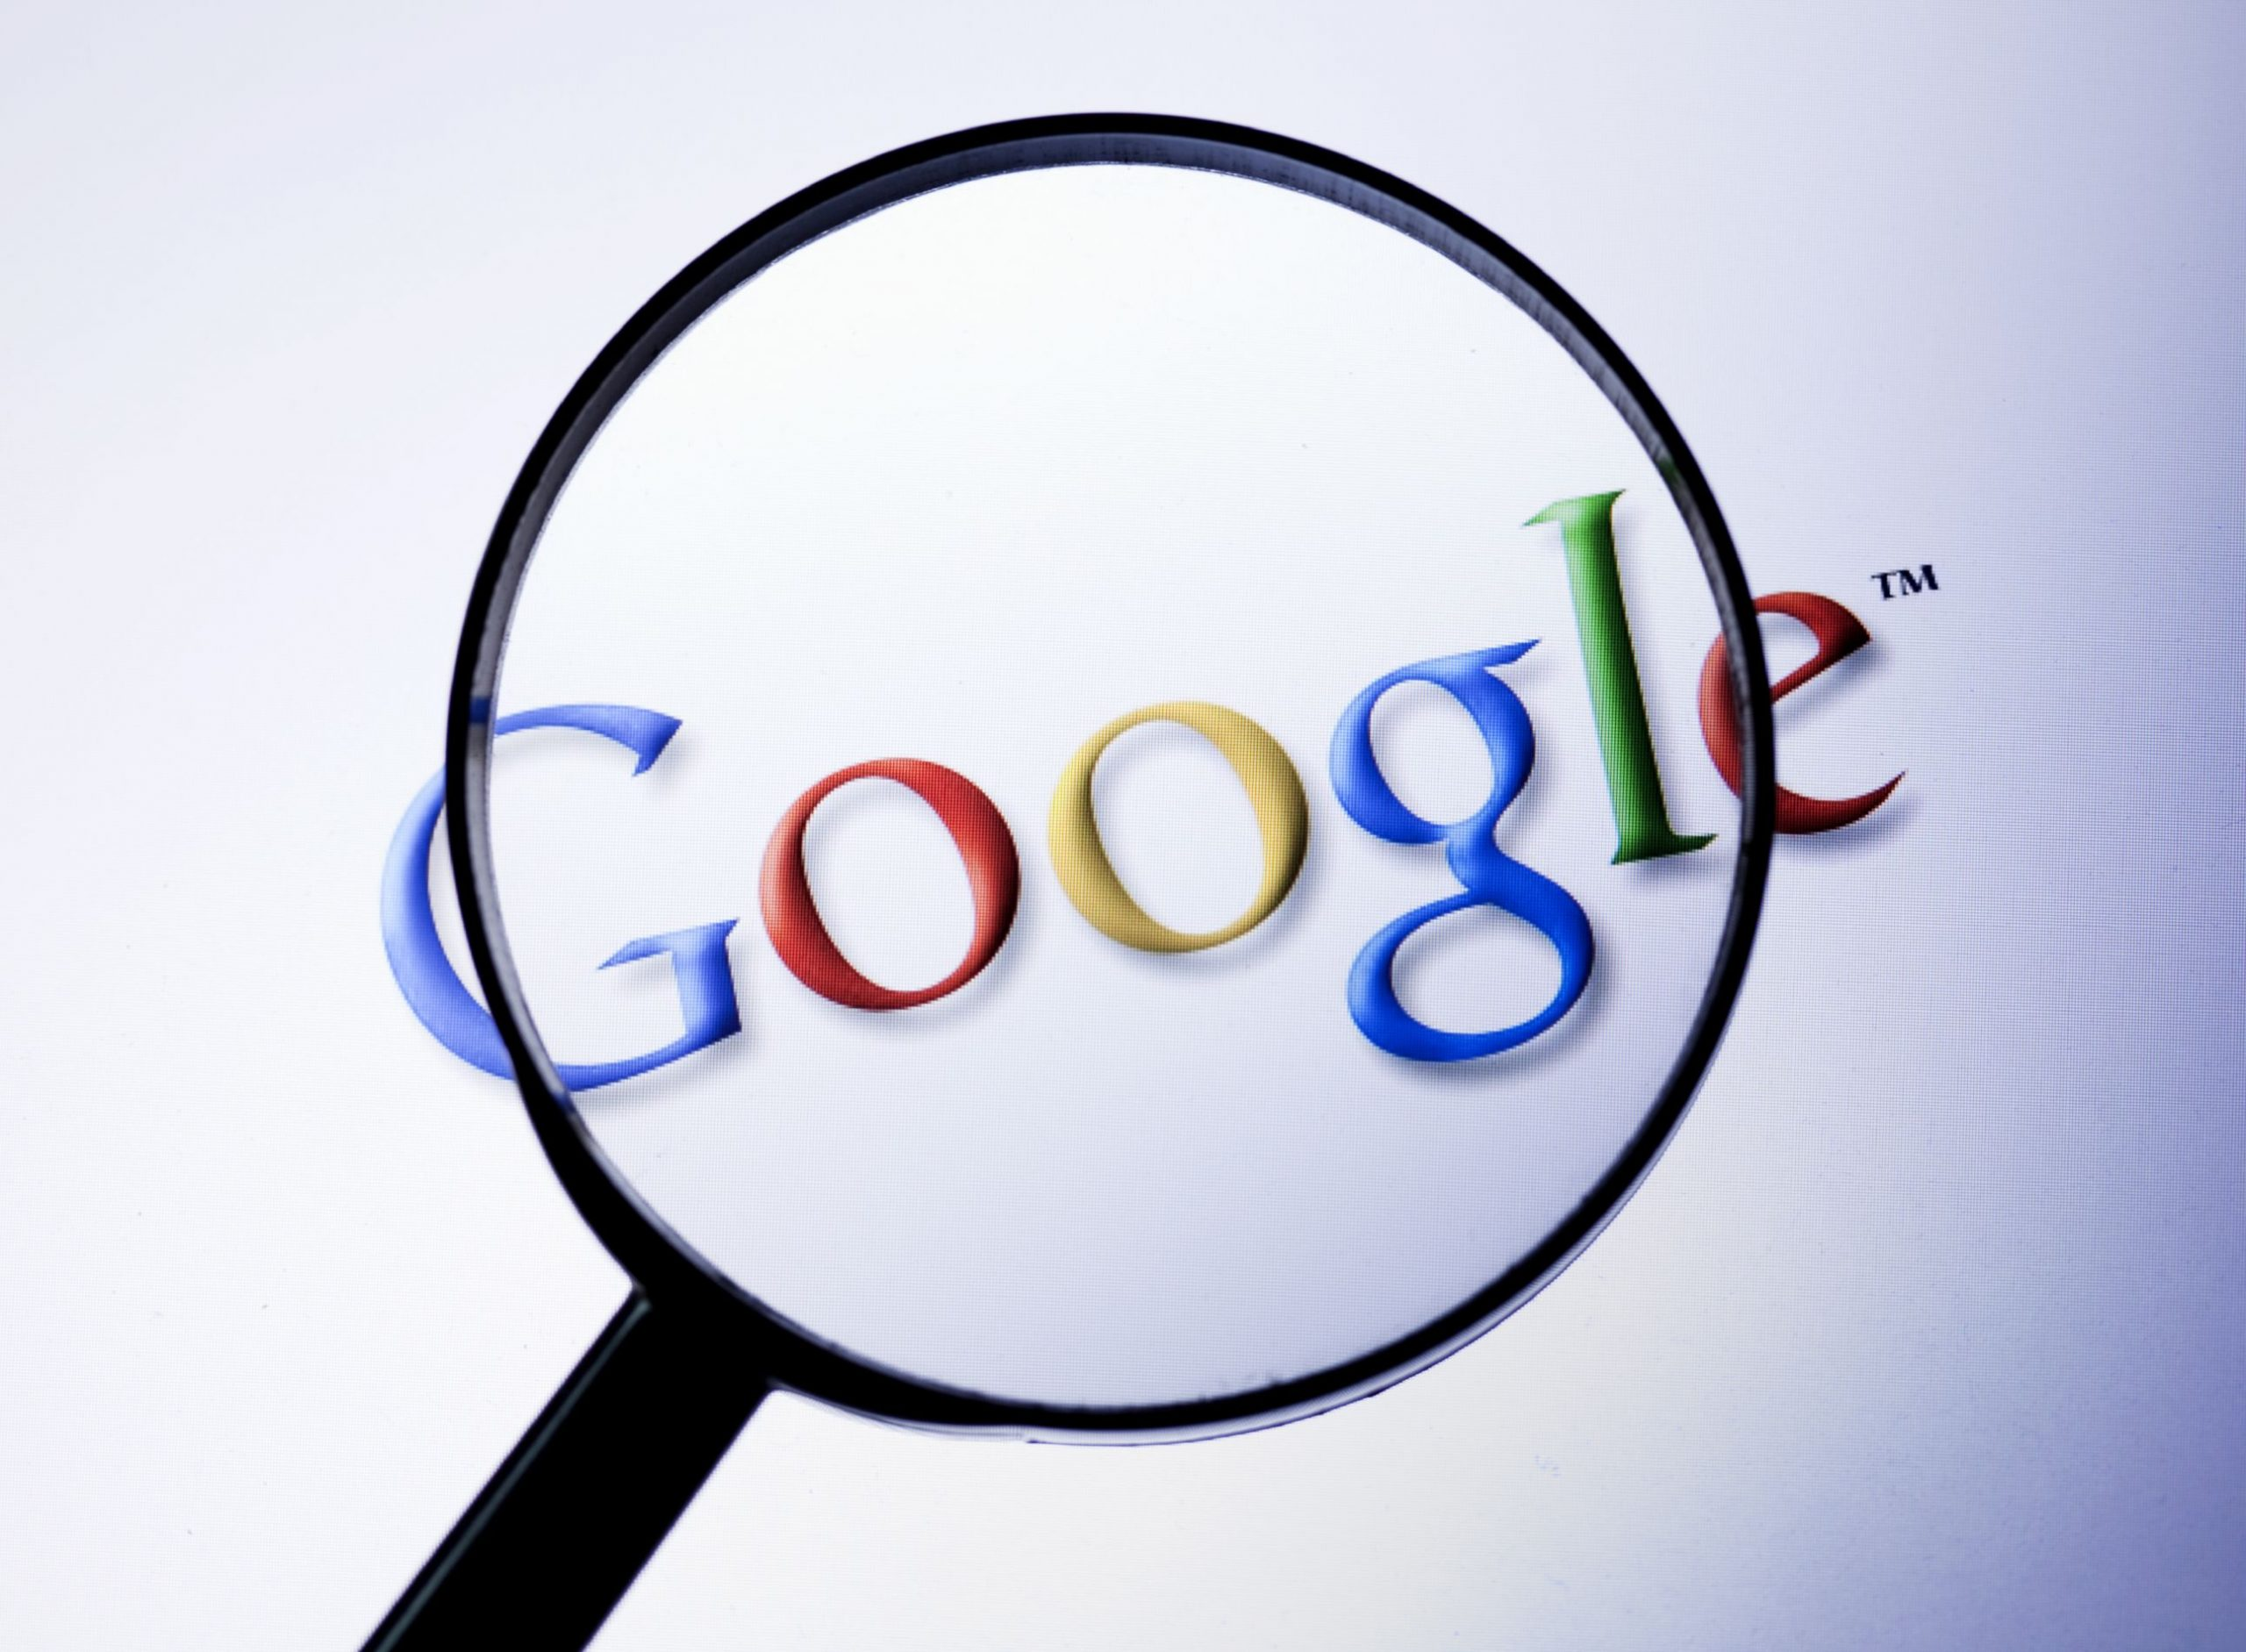 cybercypher - google